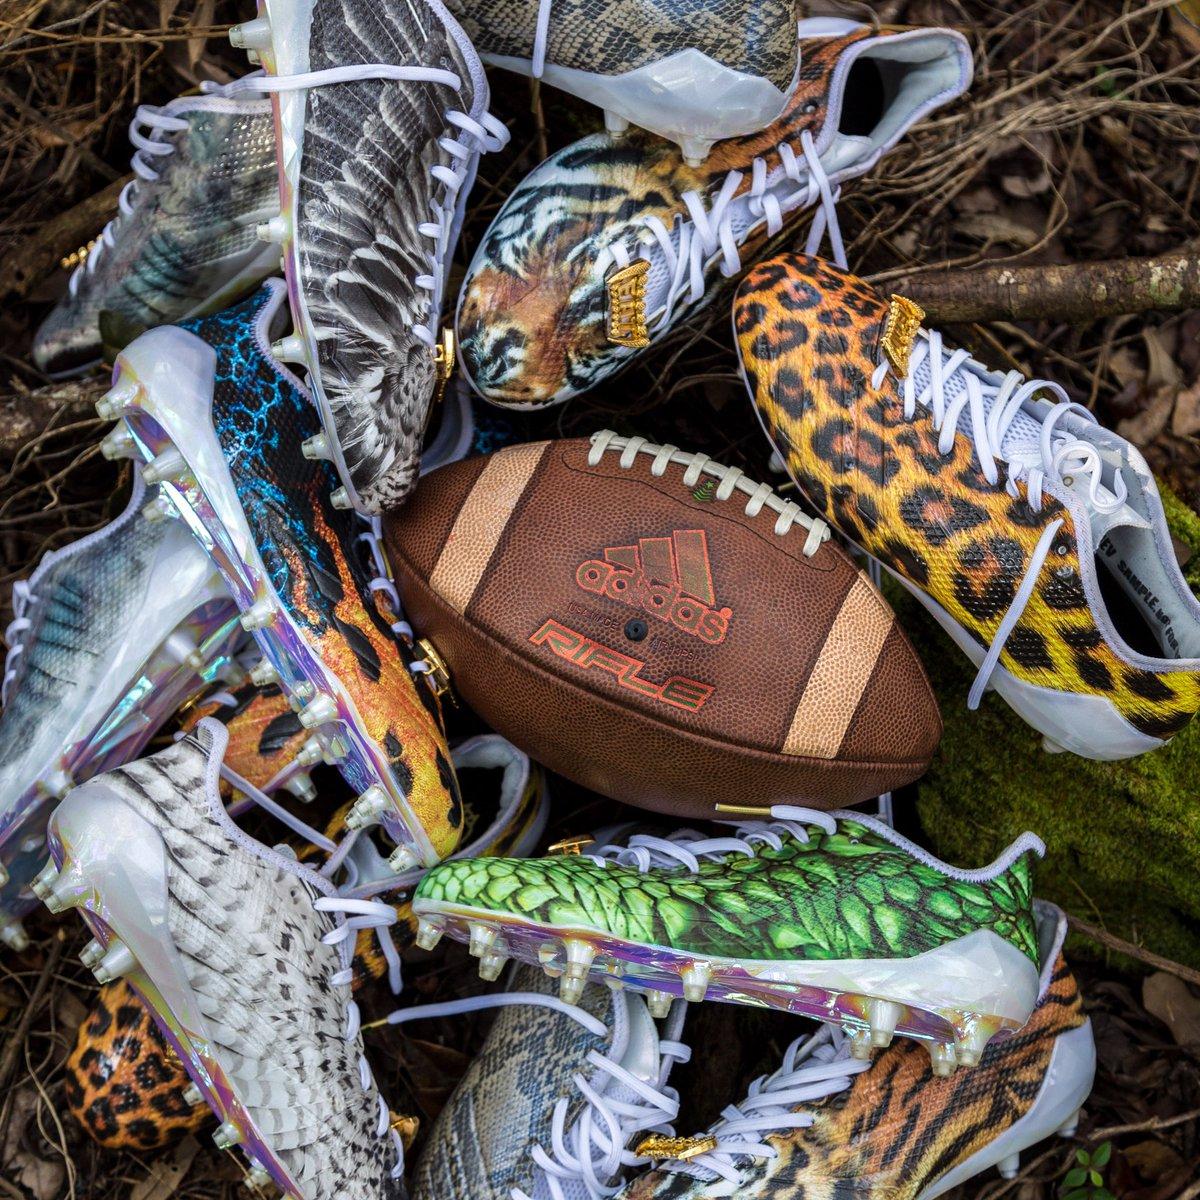 Adidas Adizero 5-stjerners 6,0 Uncaged - Menn